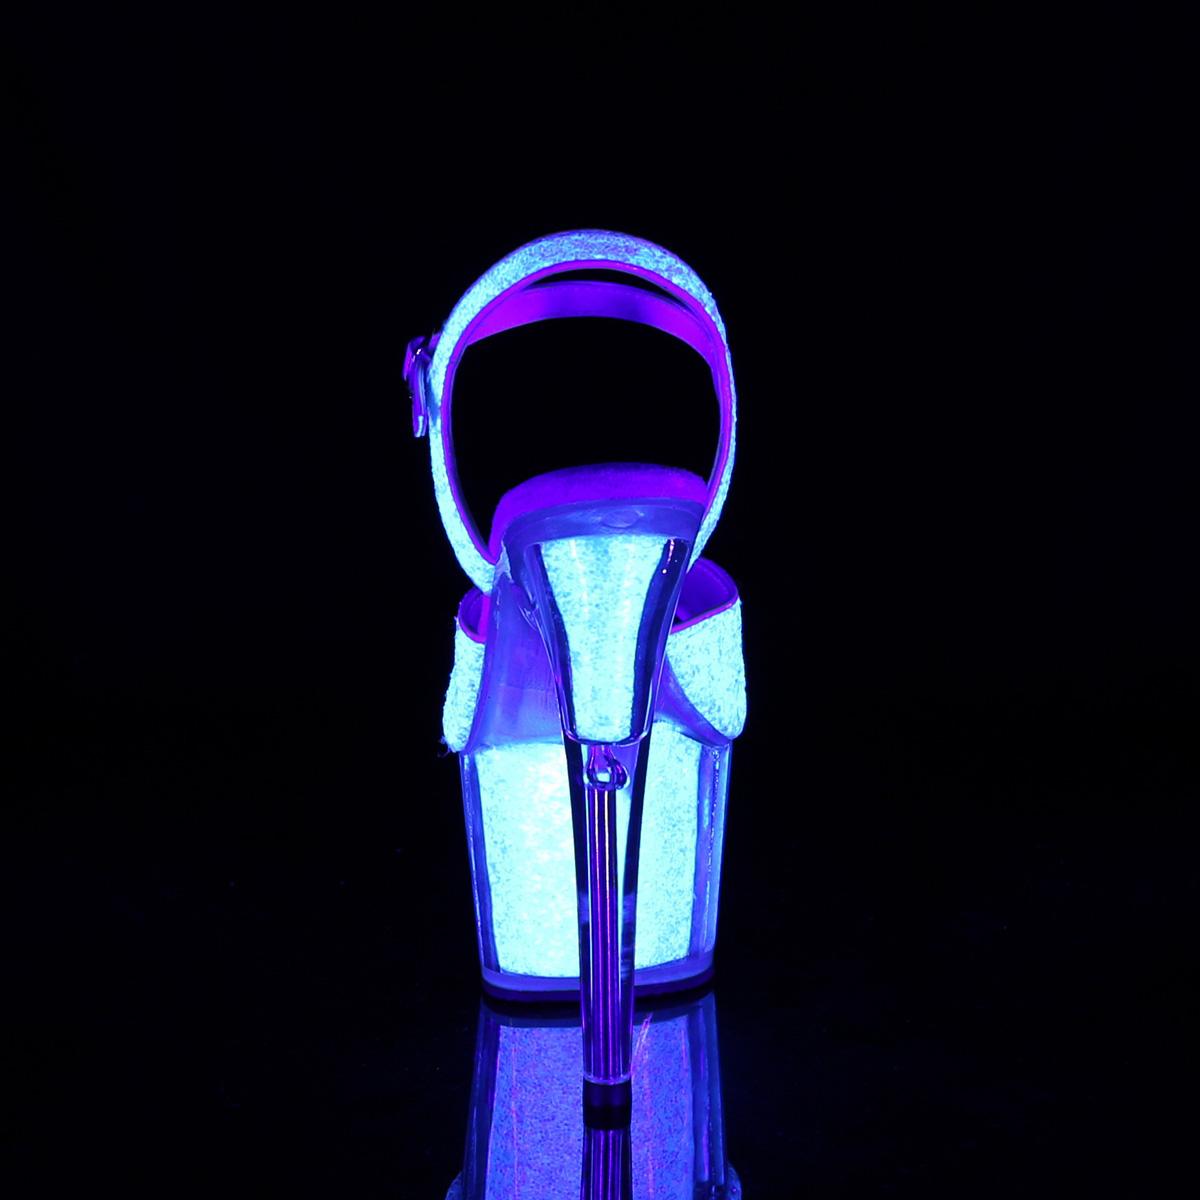 Pleaser(プリーザー) ADORE-710UVG UV蛍光 ブラックライト蛍光 厚底サンダル ネオンオパールグリッター◆取り寄せ